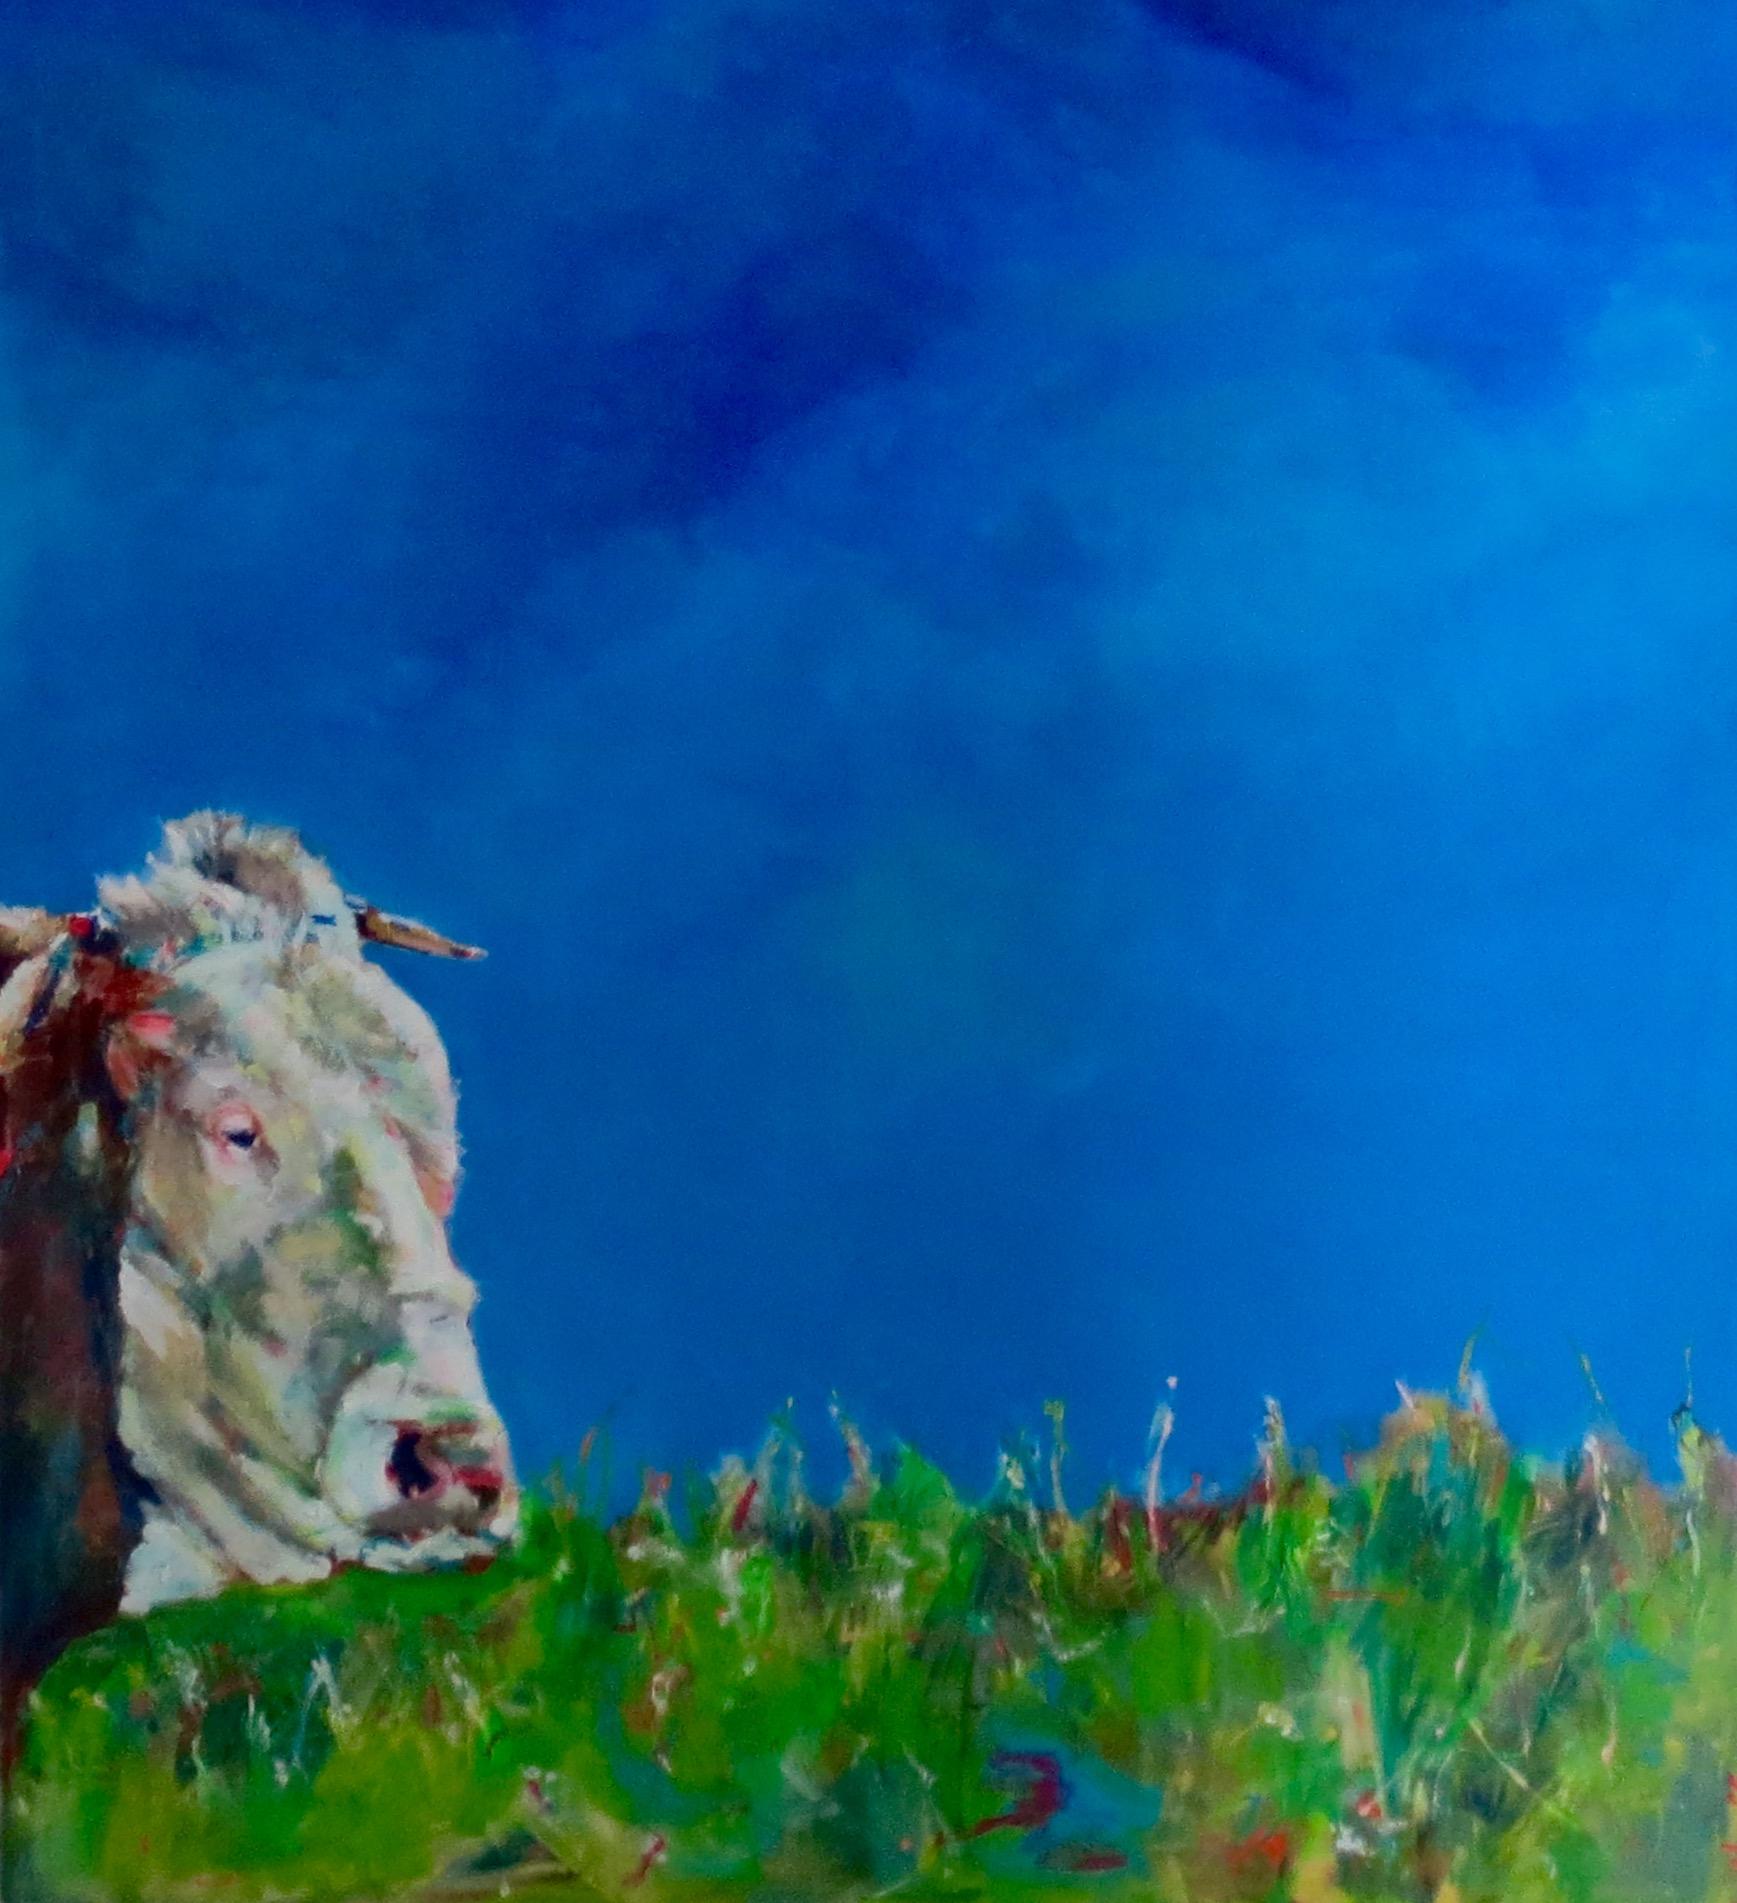 O vizinho, 150x120 acrylic on canvas